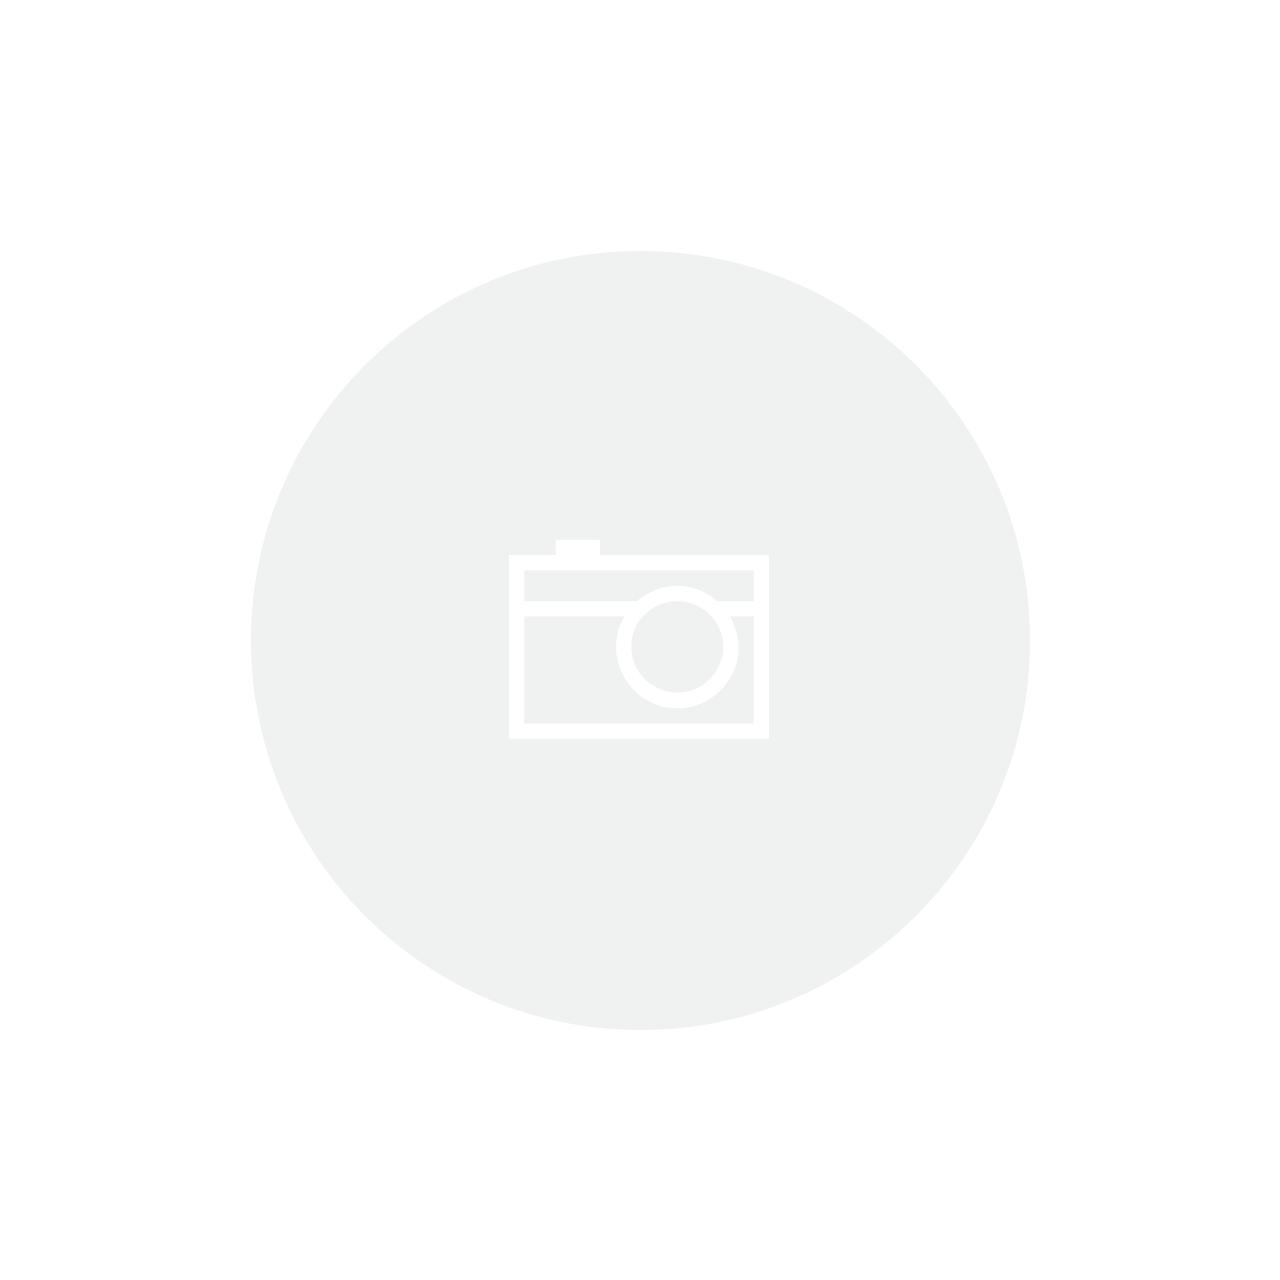 Batedor Manual ø 30 cm Speciale Tramontina